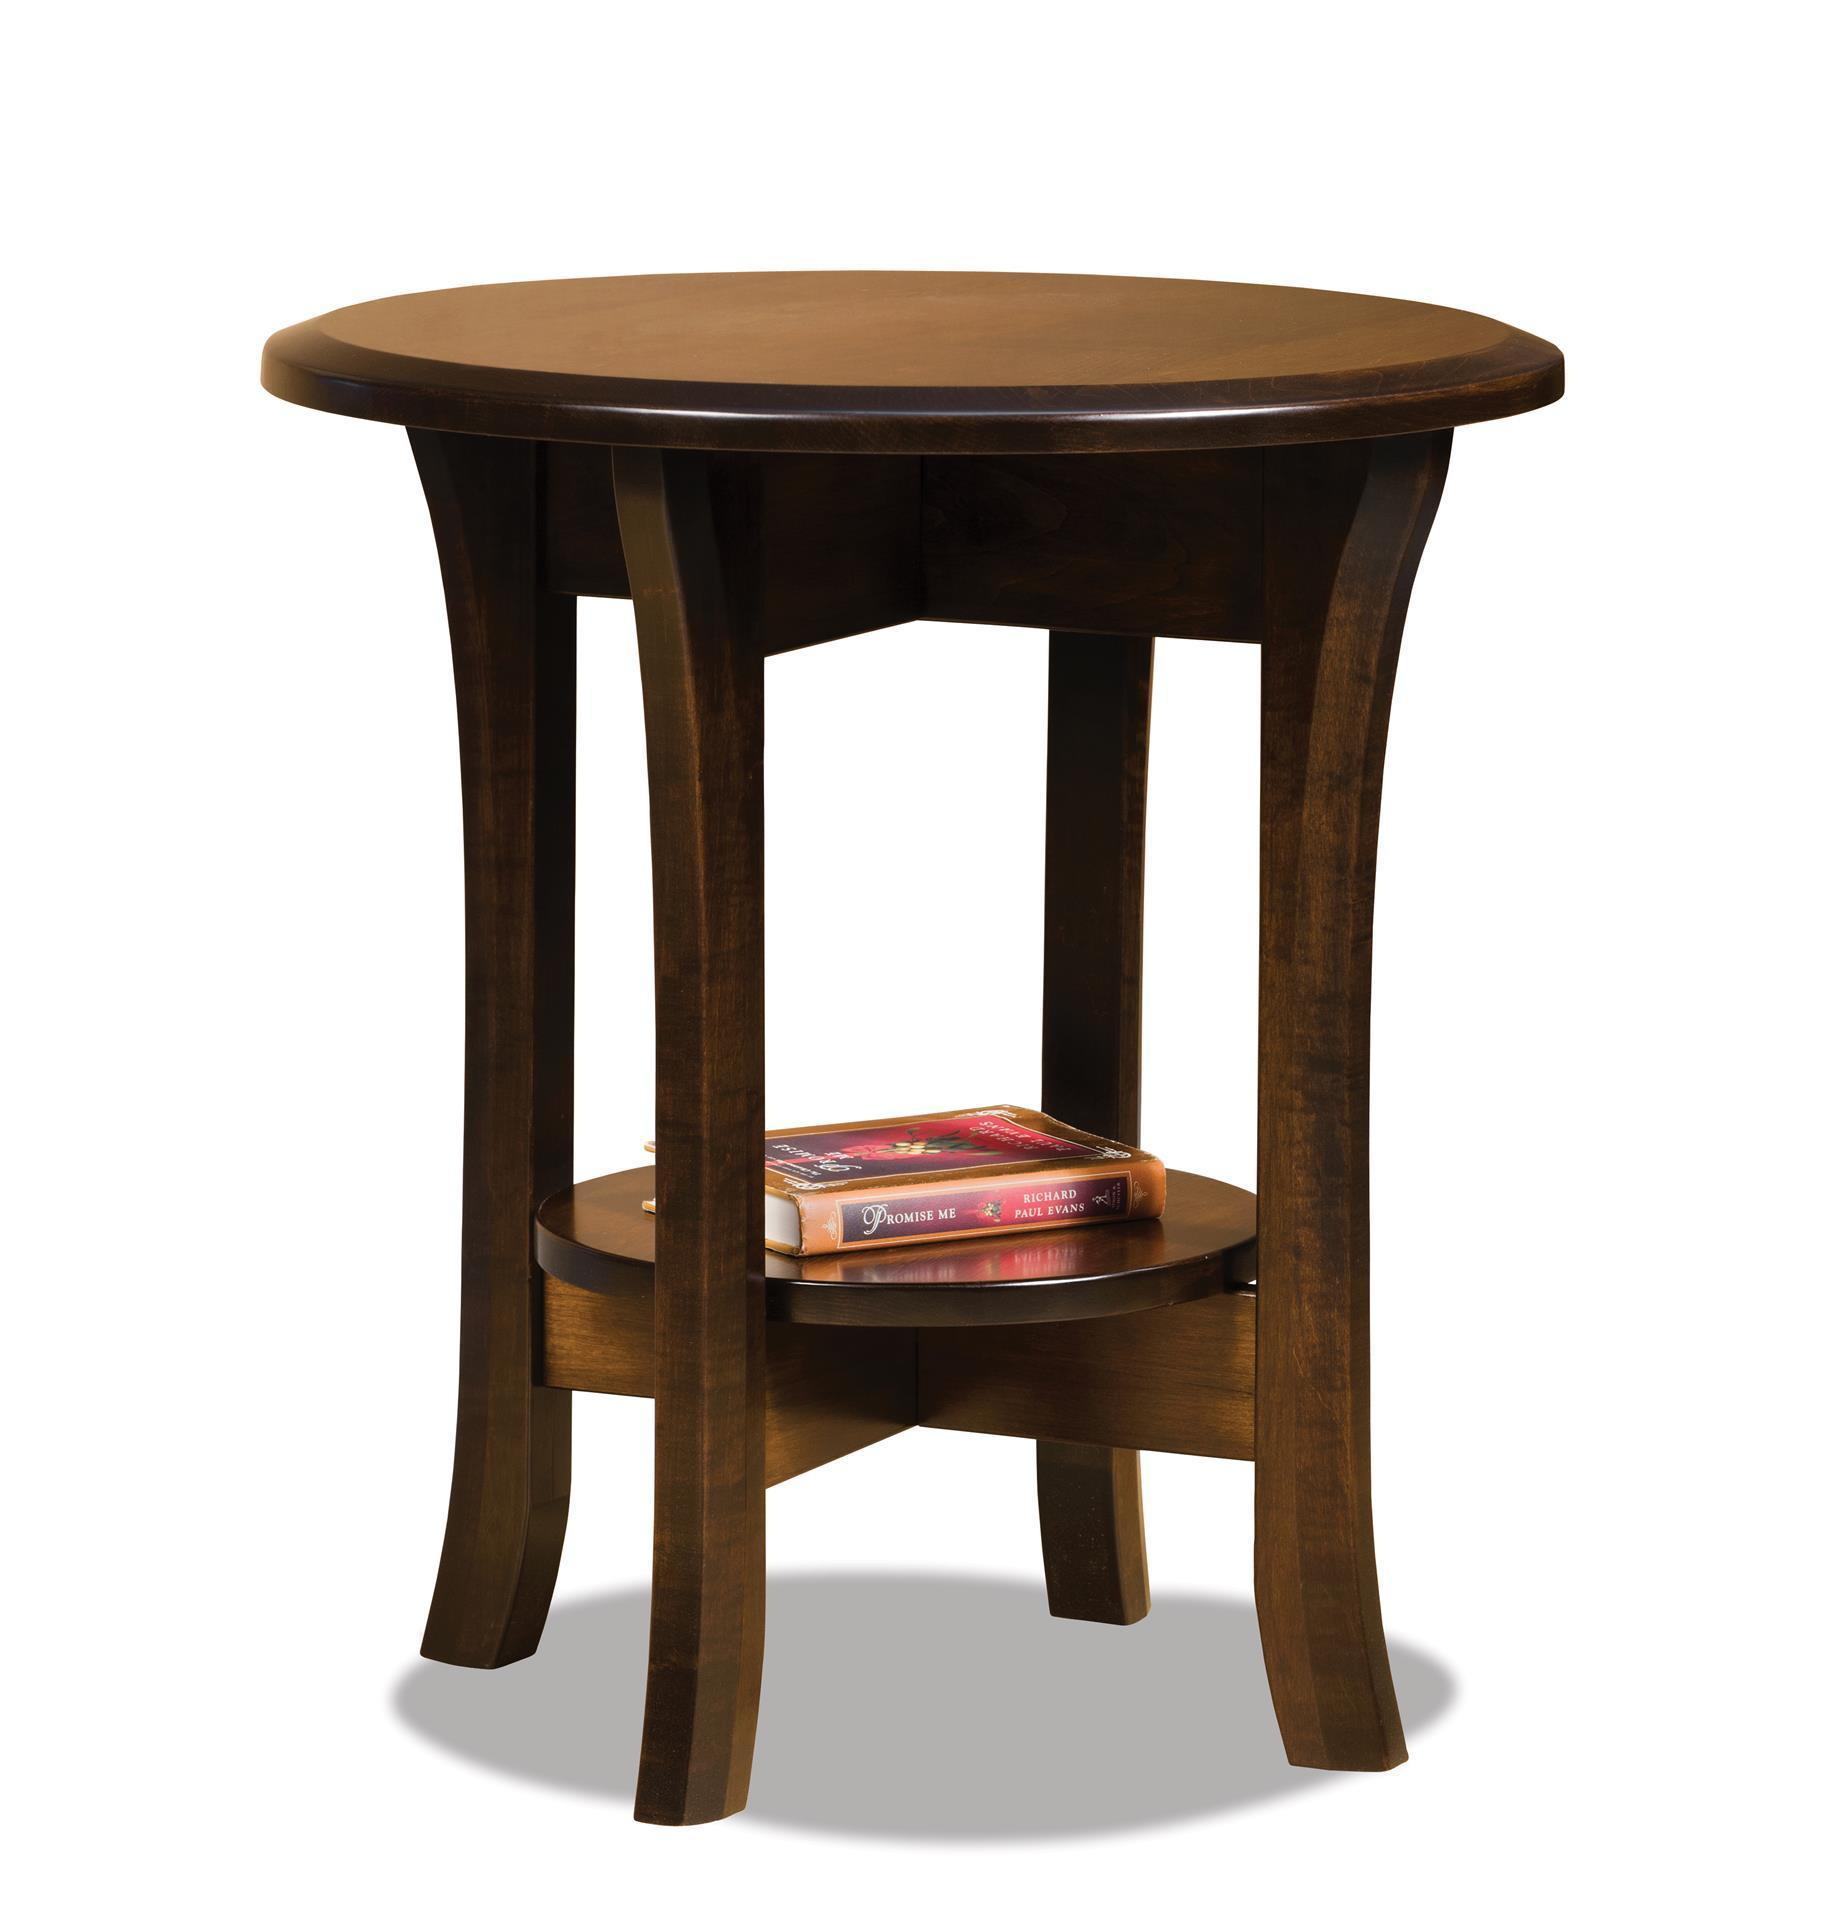 Amish Ensenada Round End Table With Shelf